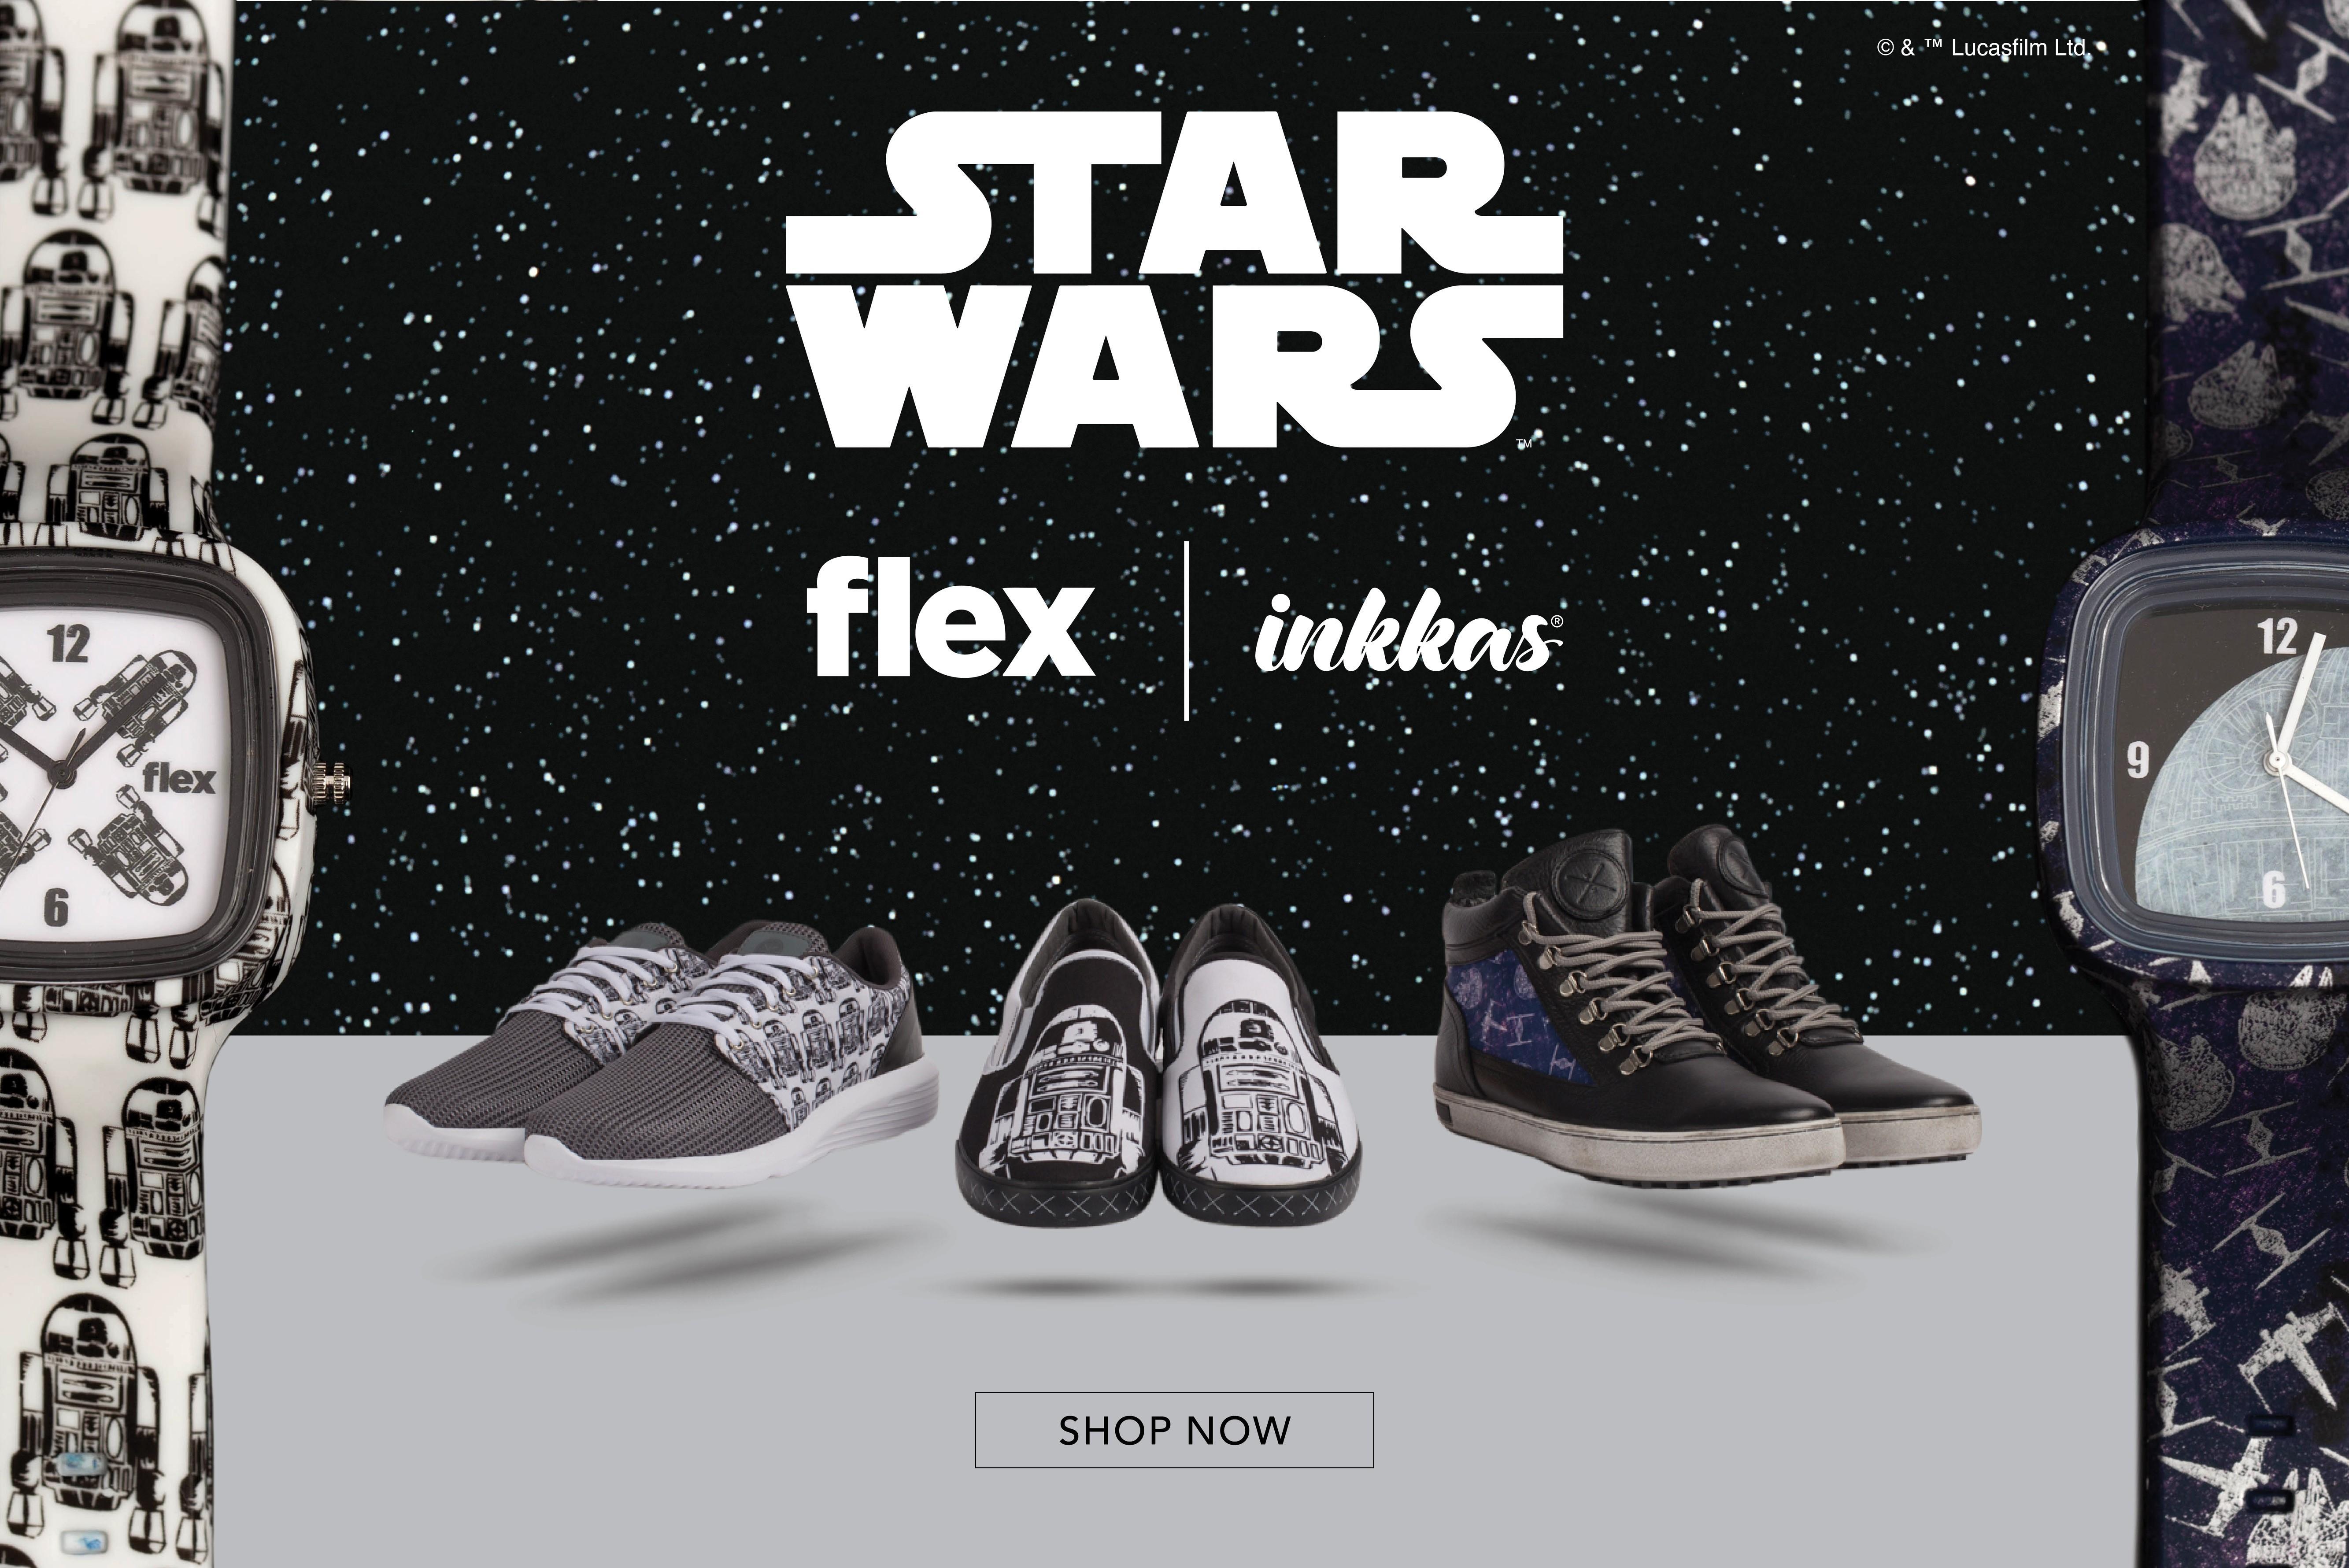 01554da06c Flex Watches and Inkkas Worldwear footwear launch Star Wars themed  collections